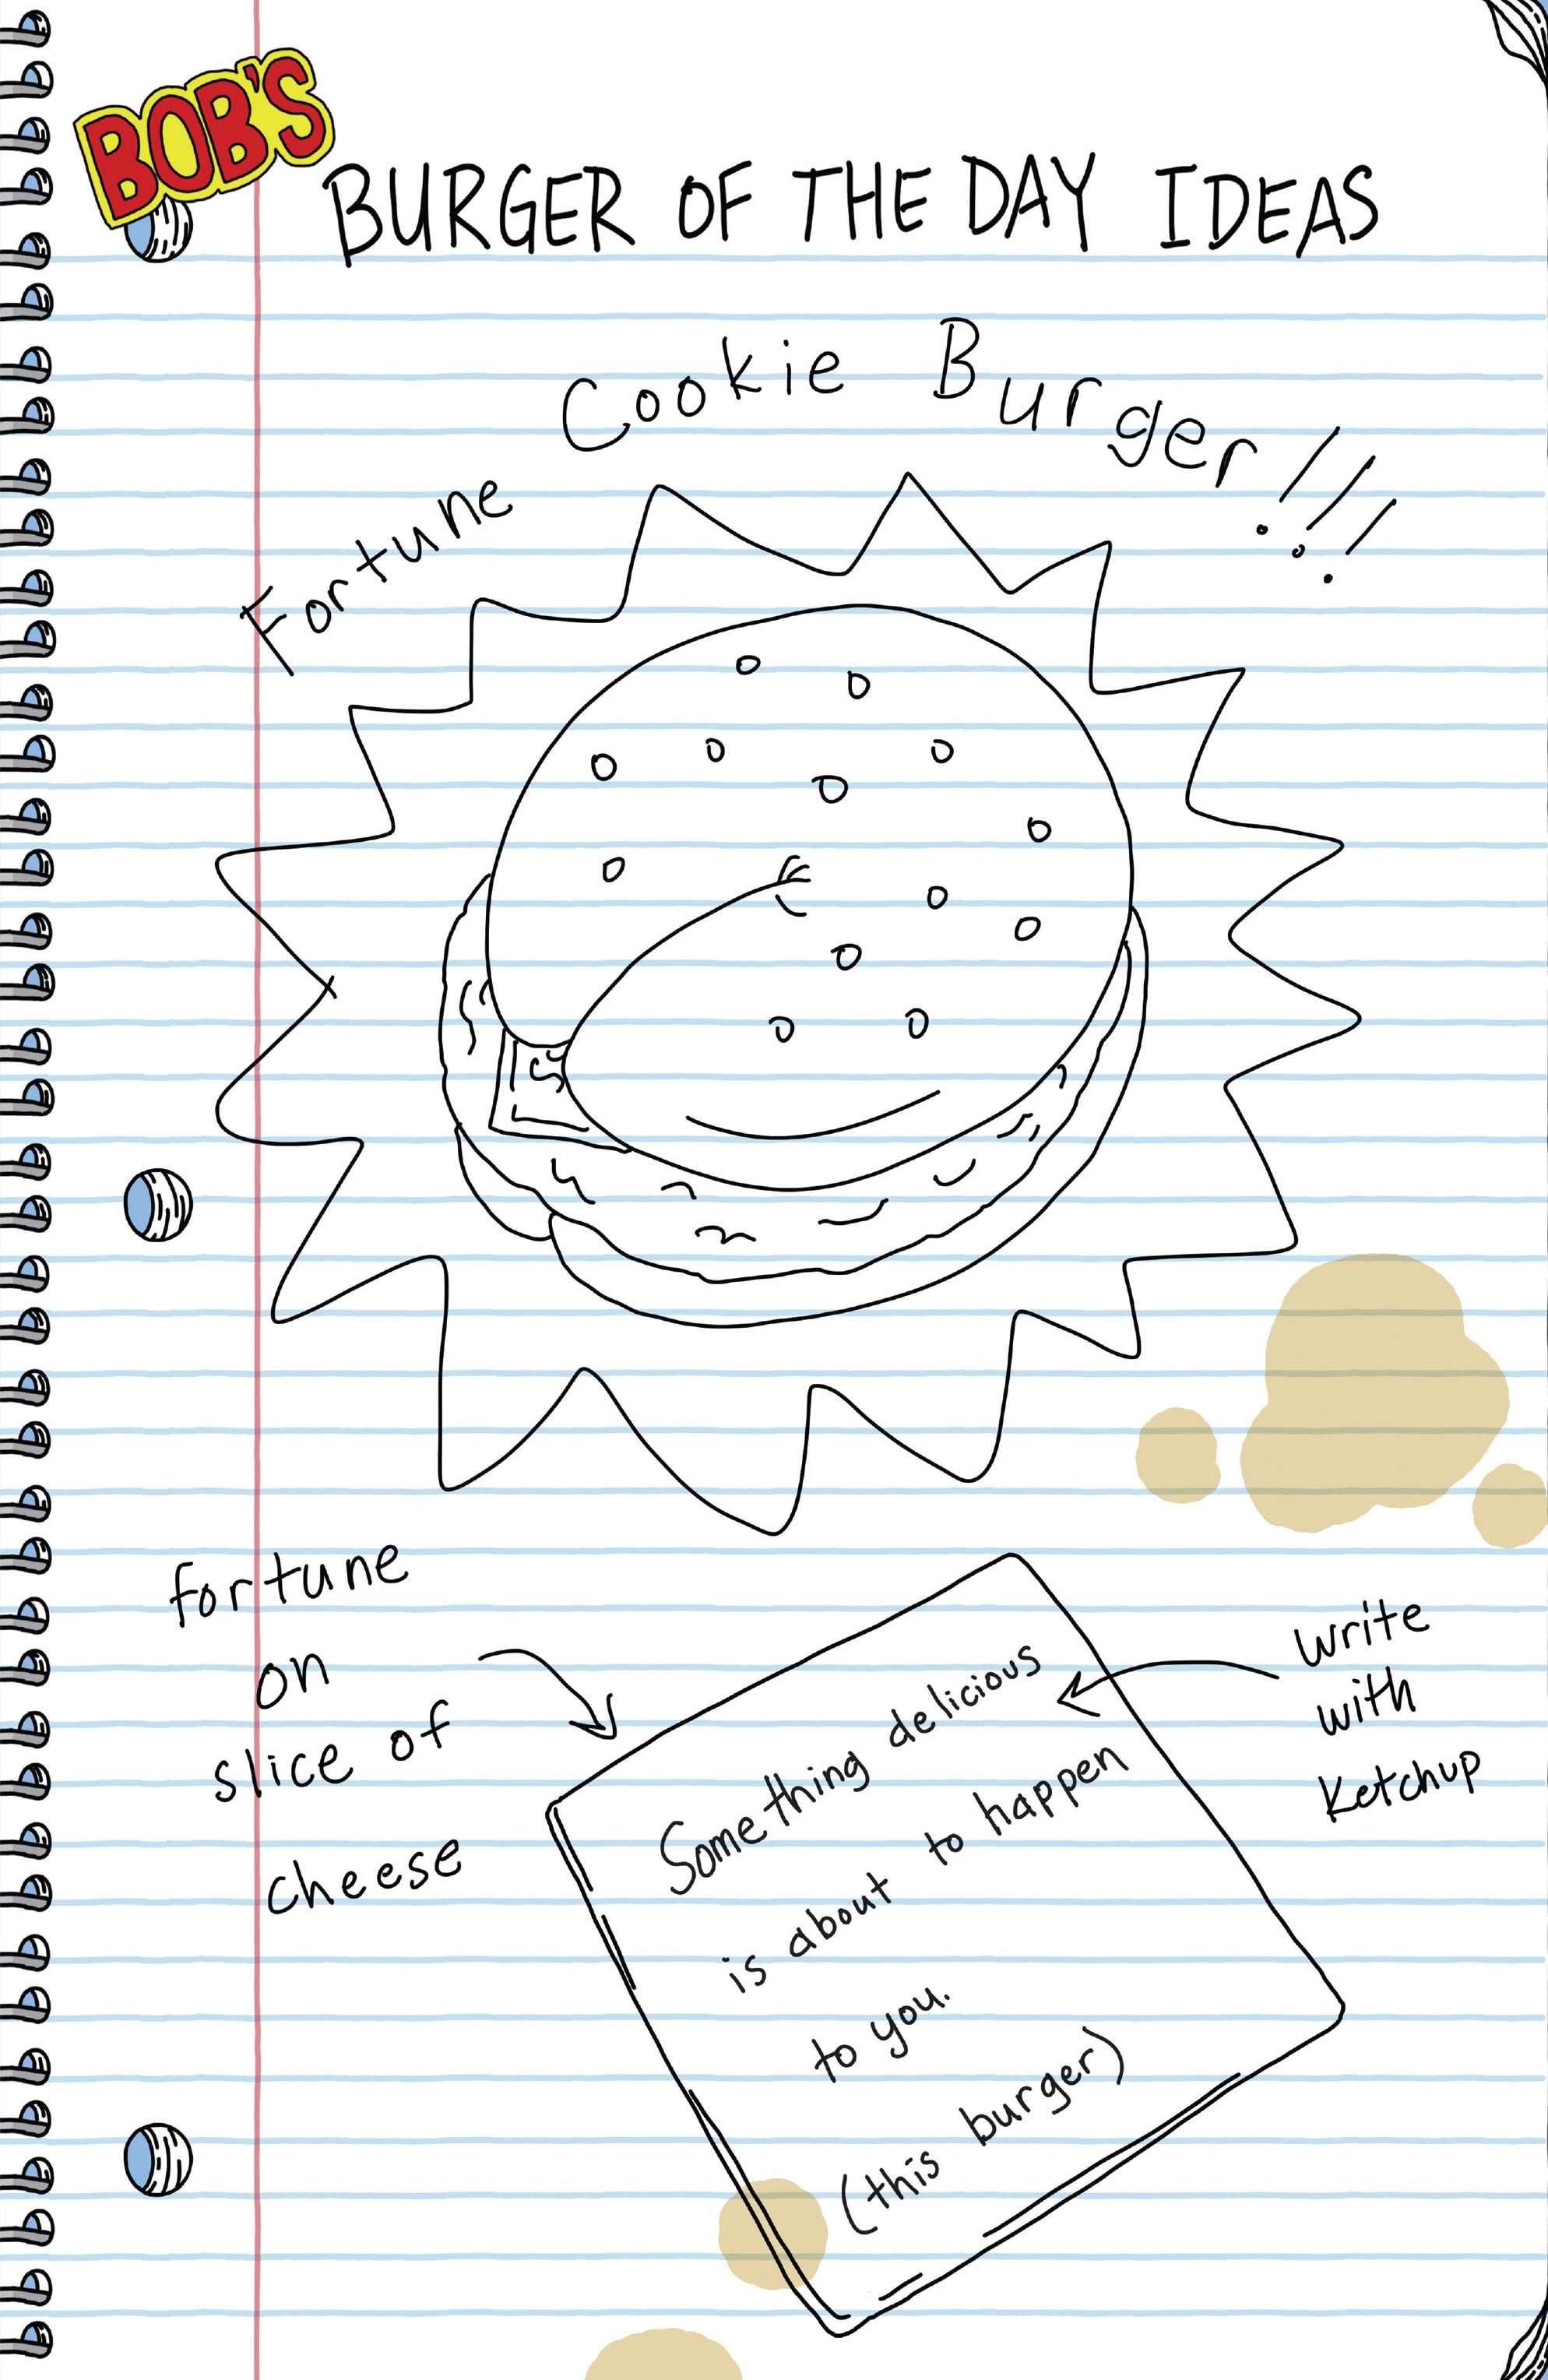 Read online Bob's Burgers (2014) comic -  Issue #3 - 11